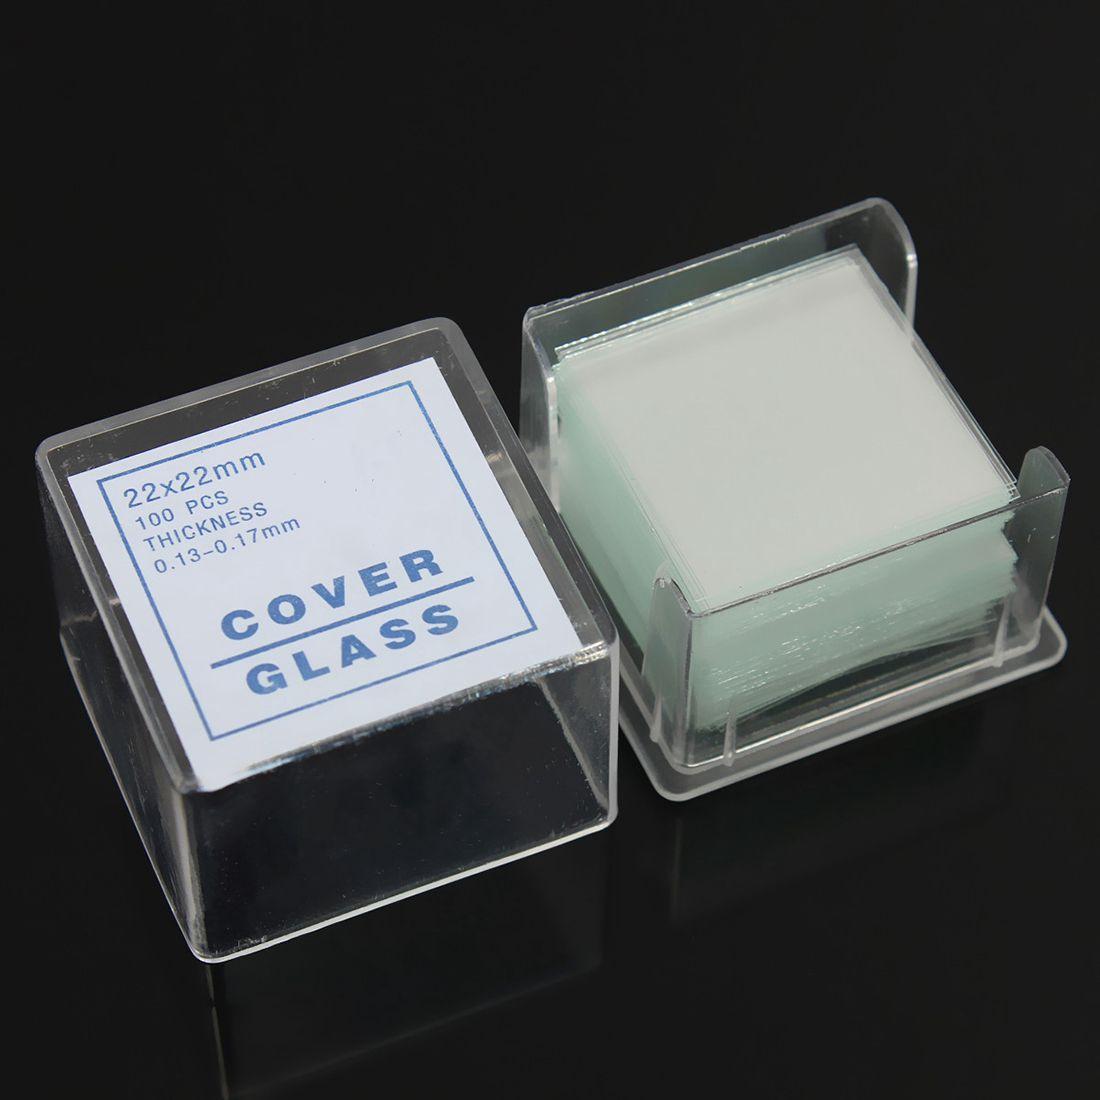 HLZS-100pcs Transparent Slides Coverslips Coverslides 22x22mm For Microscope